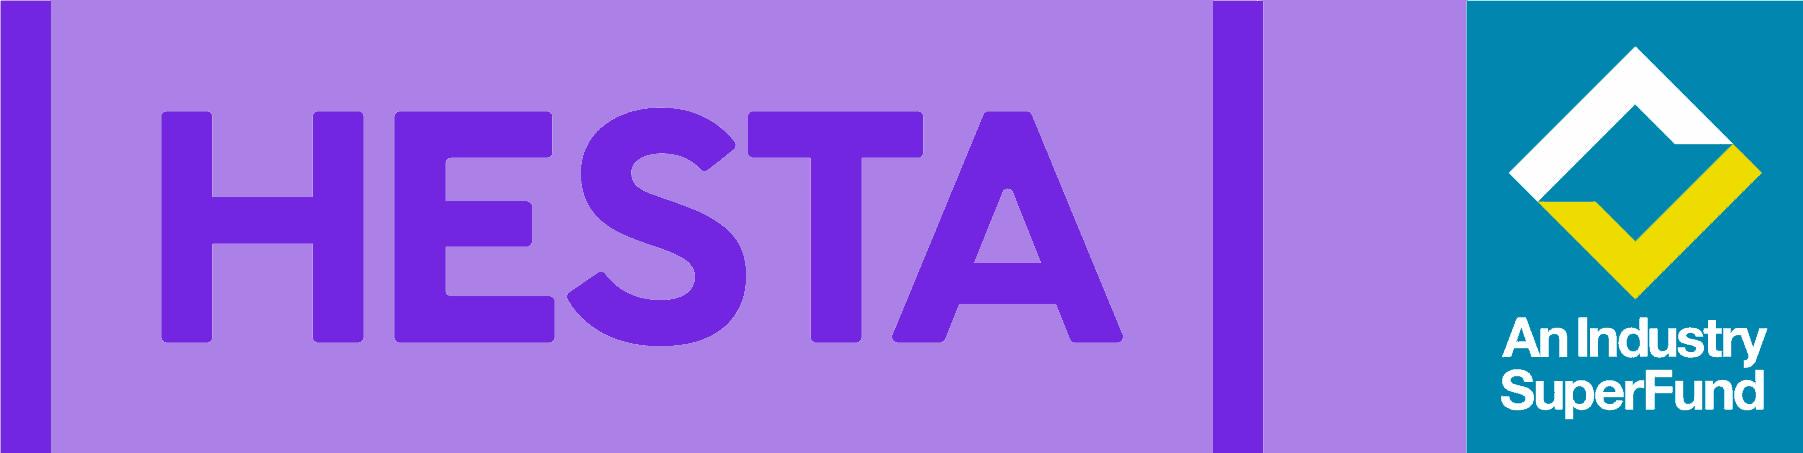 hesta logo industry lockup rgb vector.png